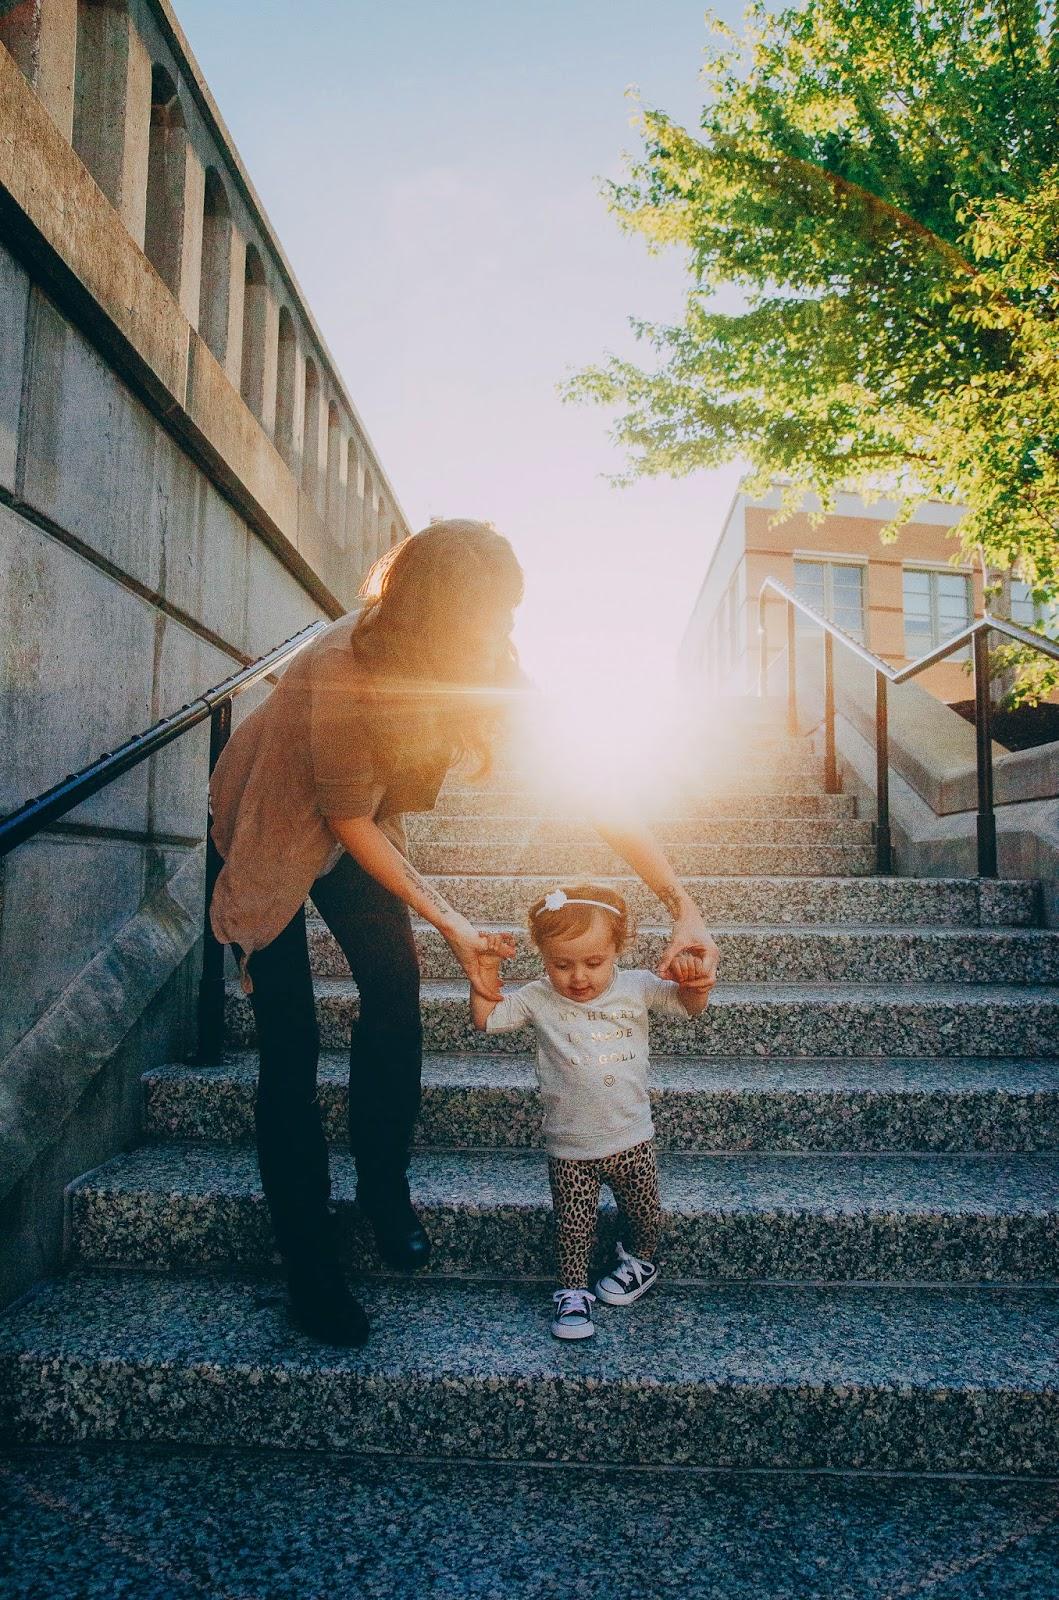 Ashlee photographs families with a nikon camera